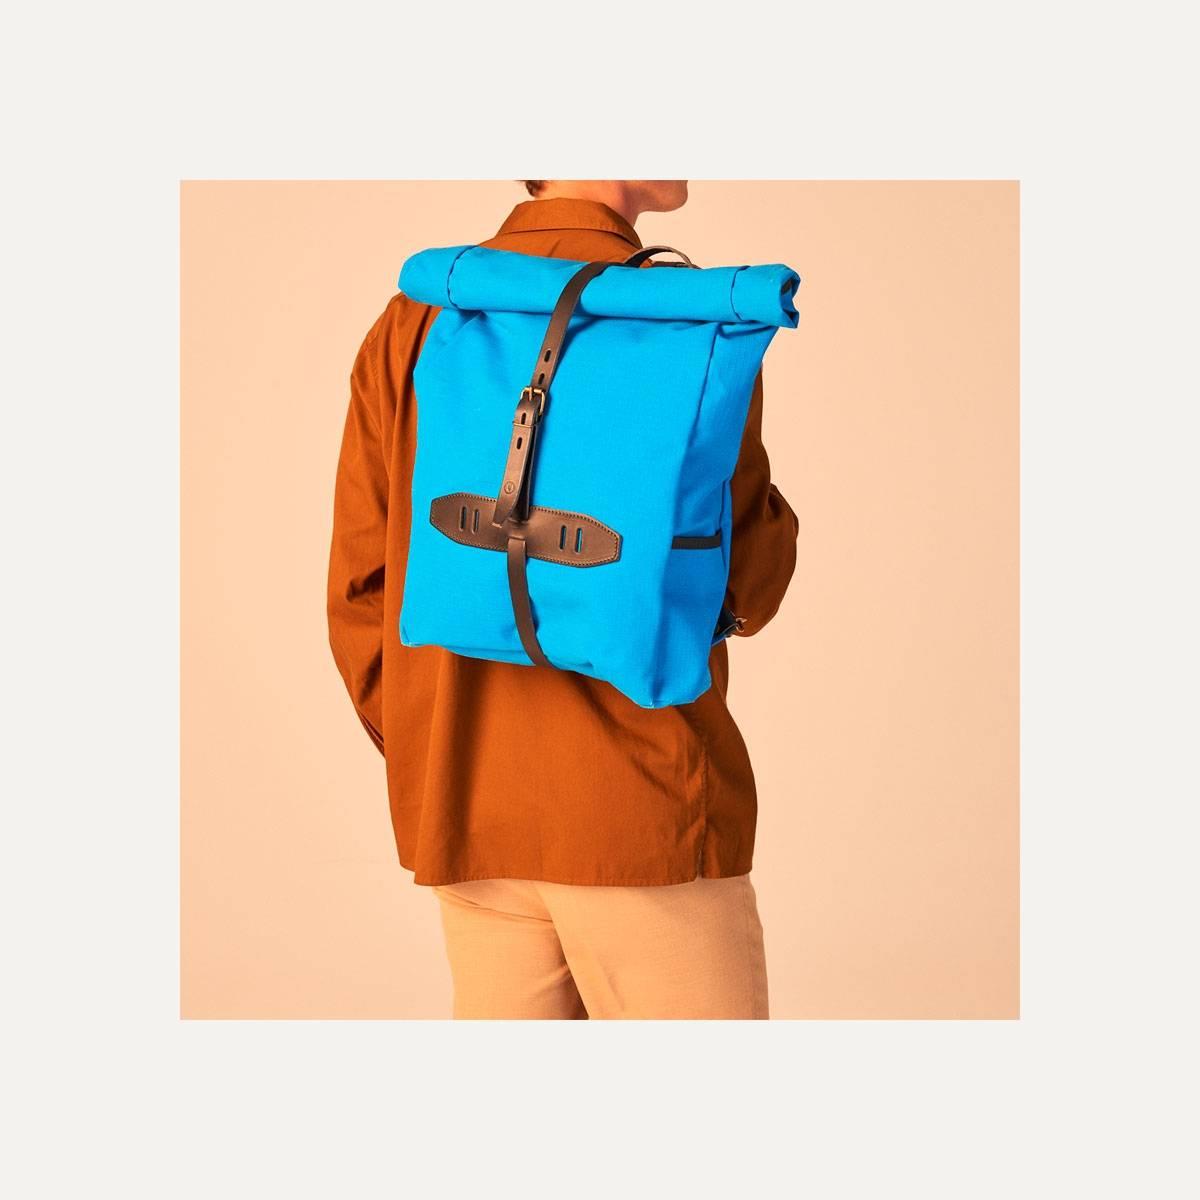 Jamy Backpack - Regentex Blue (image n°9)